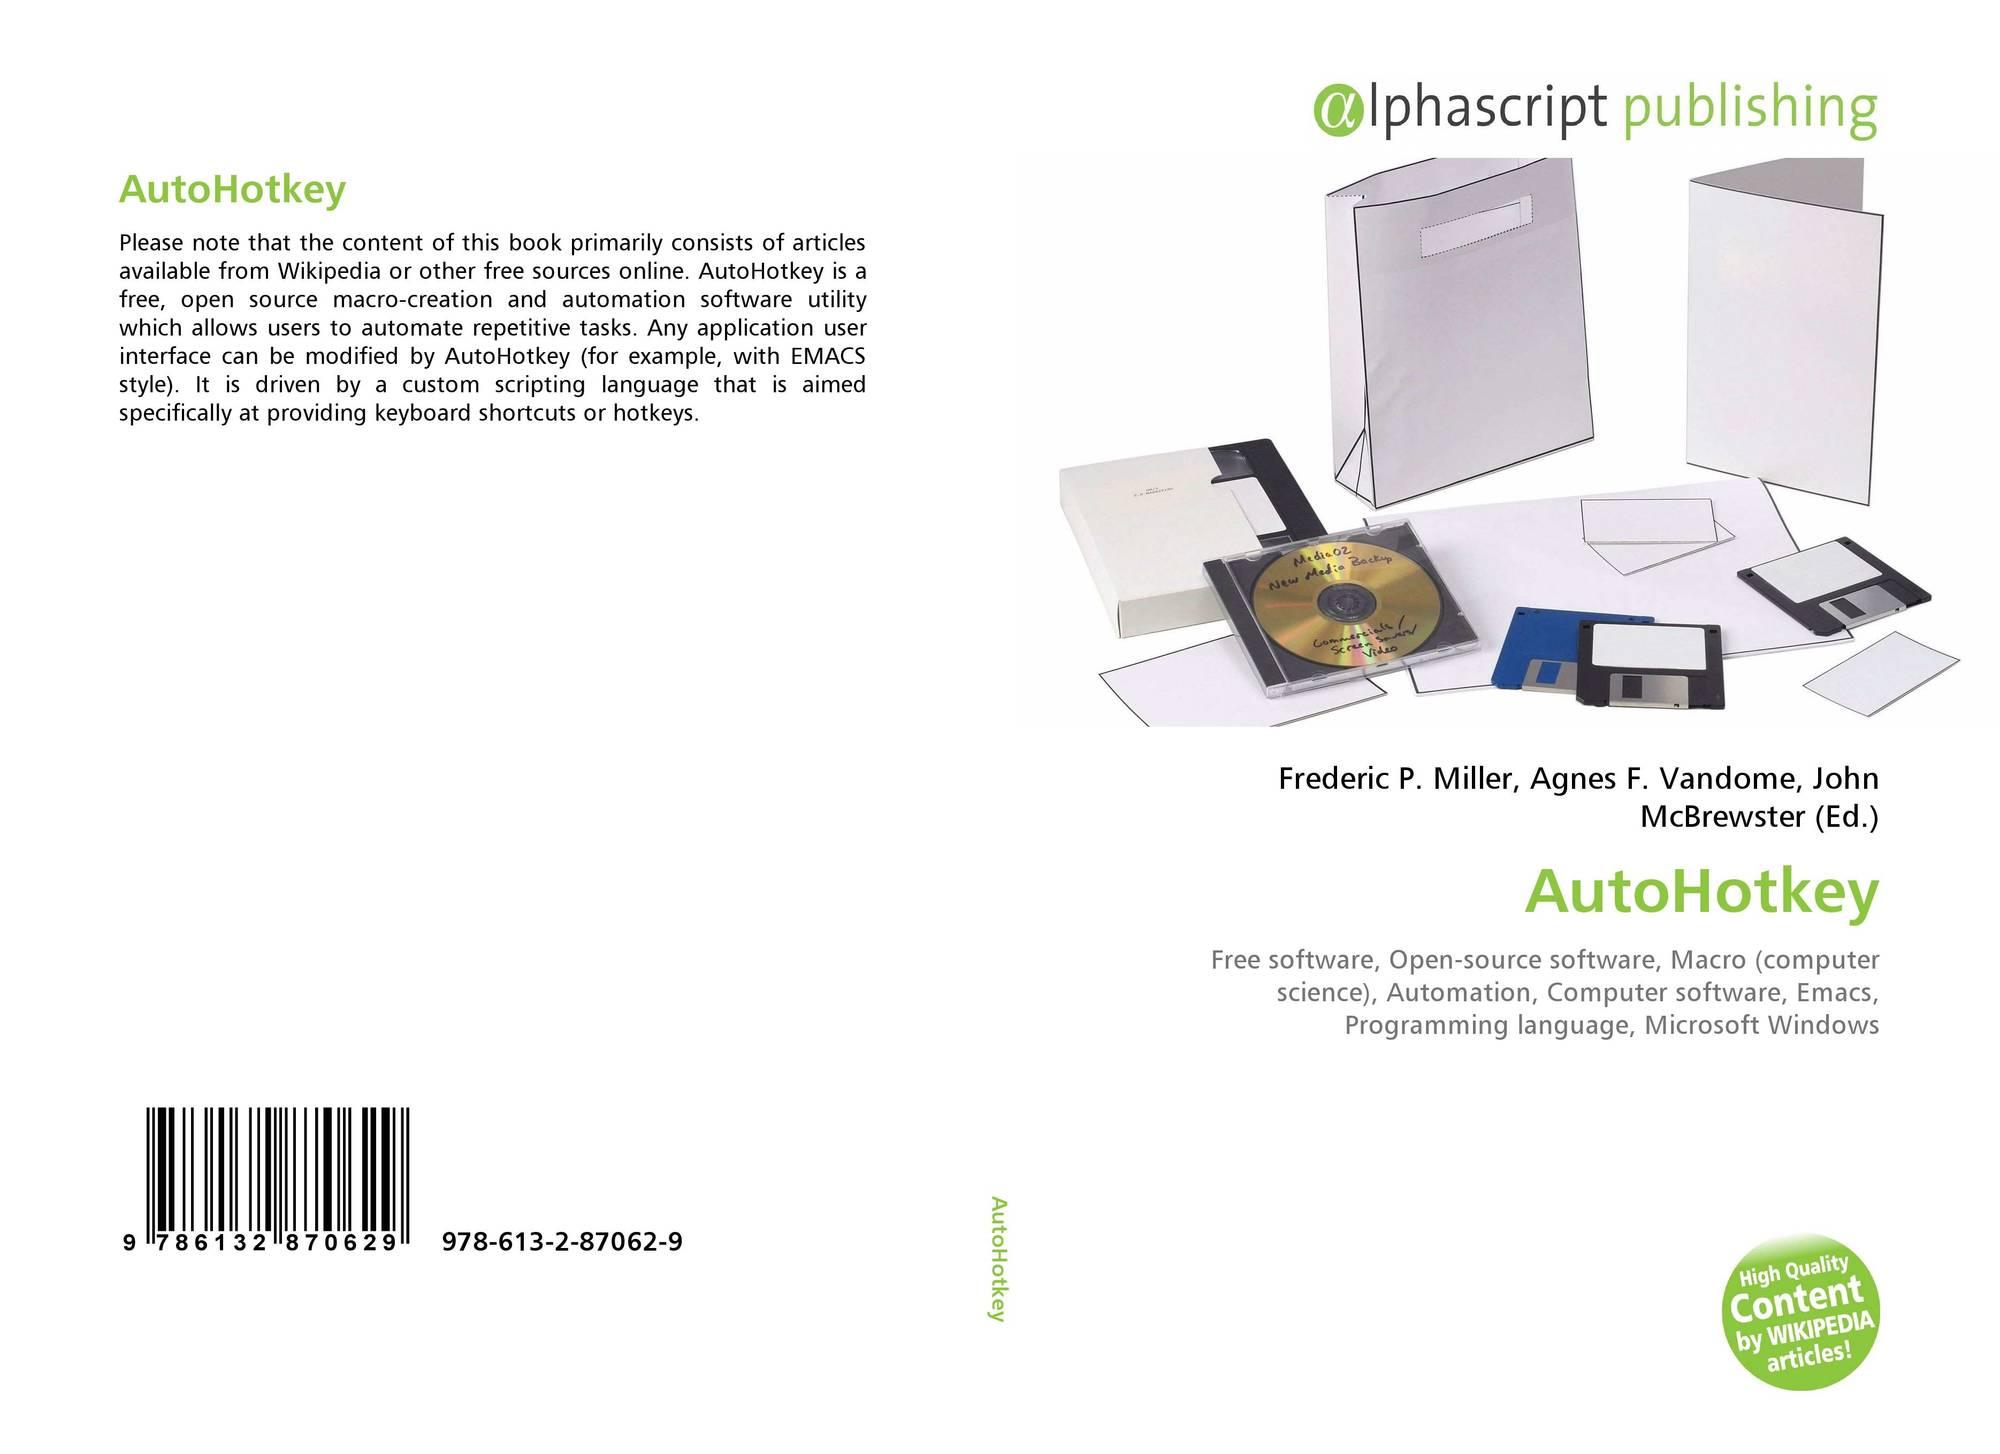 AutoHotkey, 978-613-2-87062-9, 6132870628 ,9786132870629